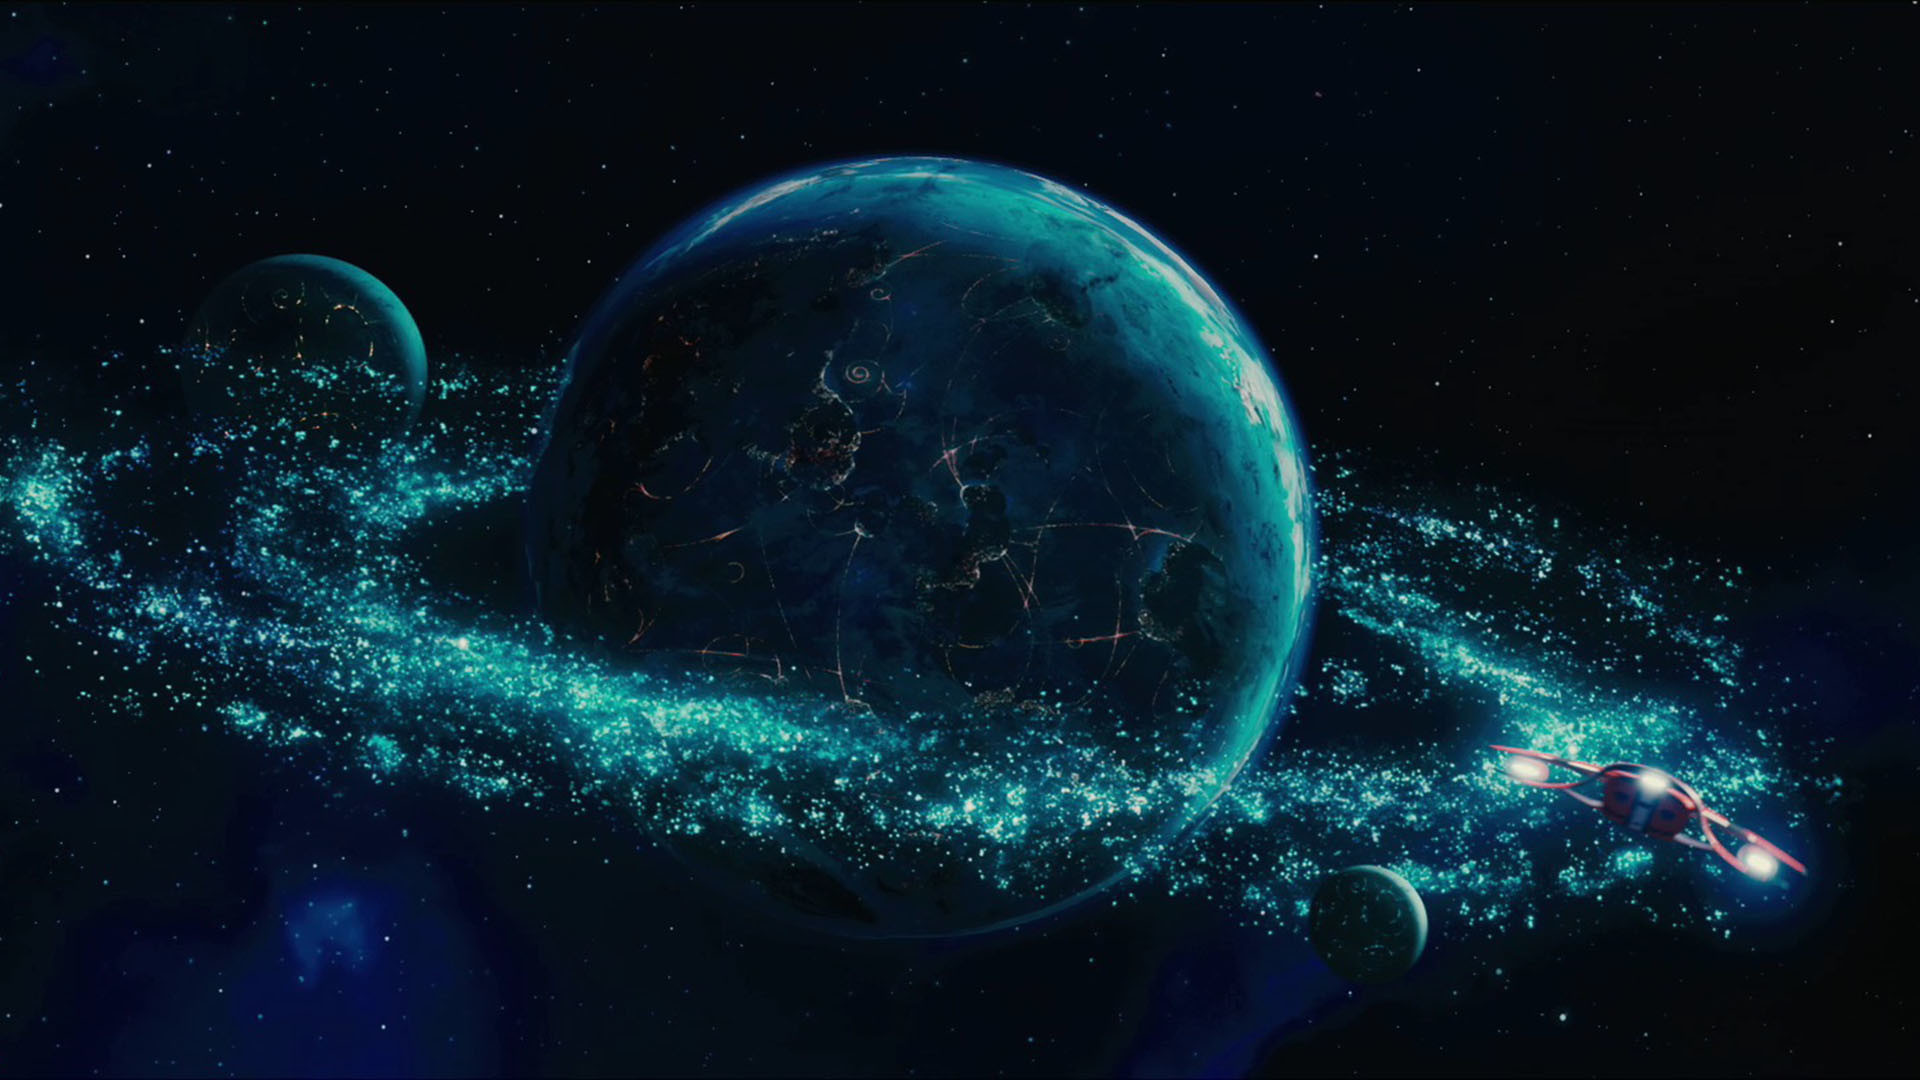 HD Earth Desktop Wallpaper (73+ images)